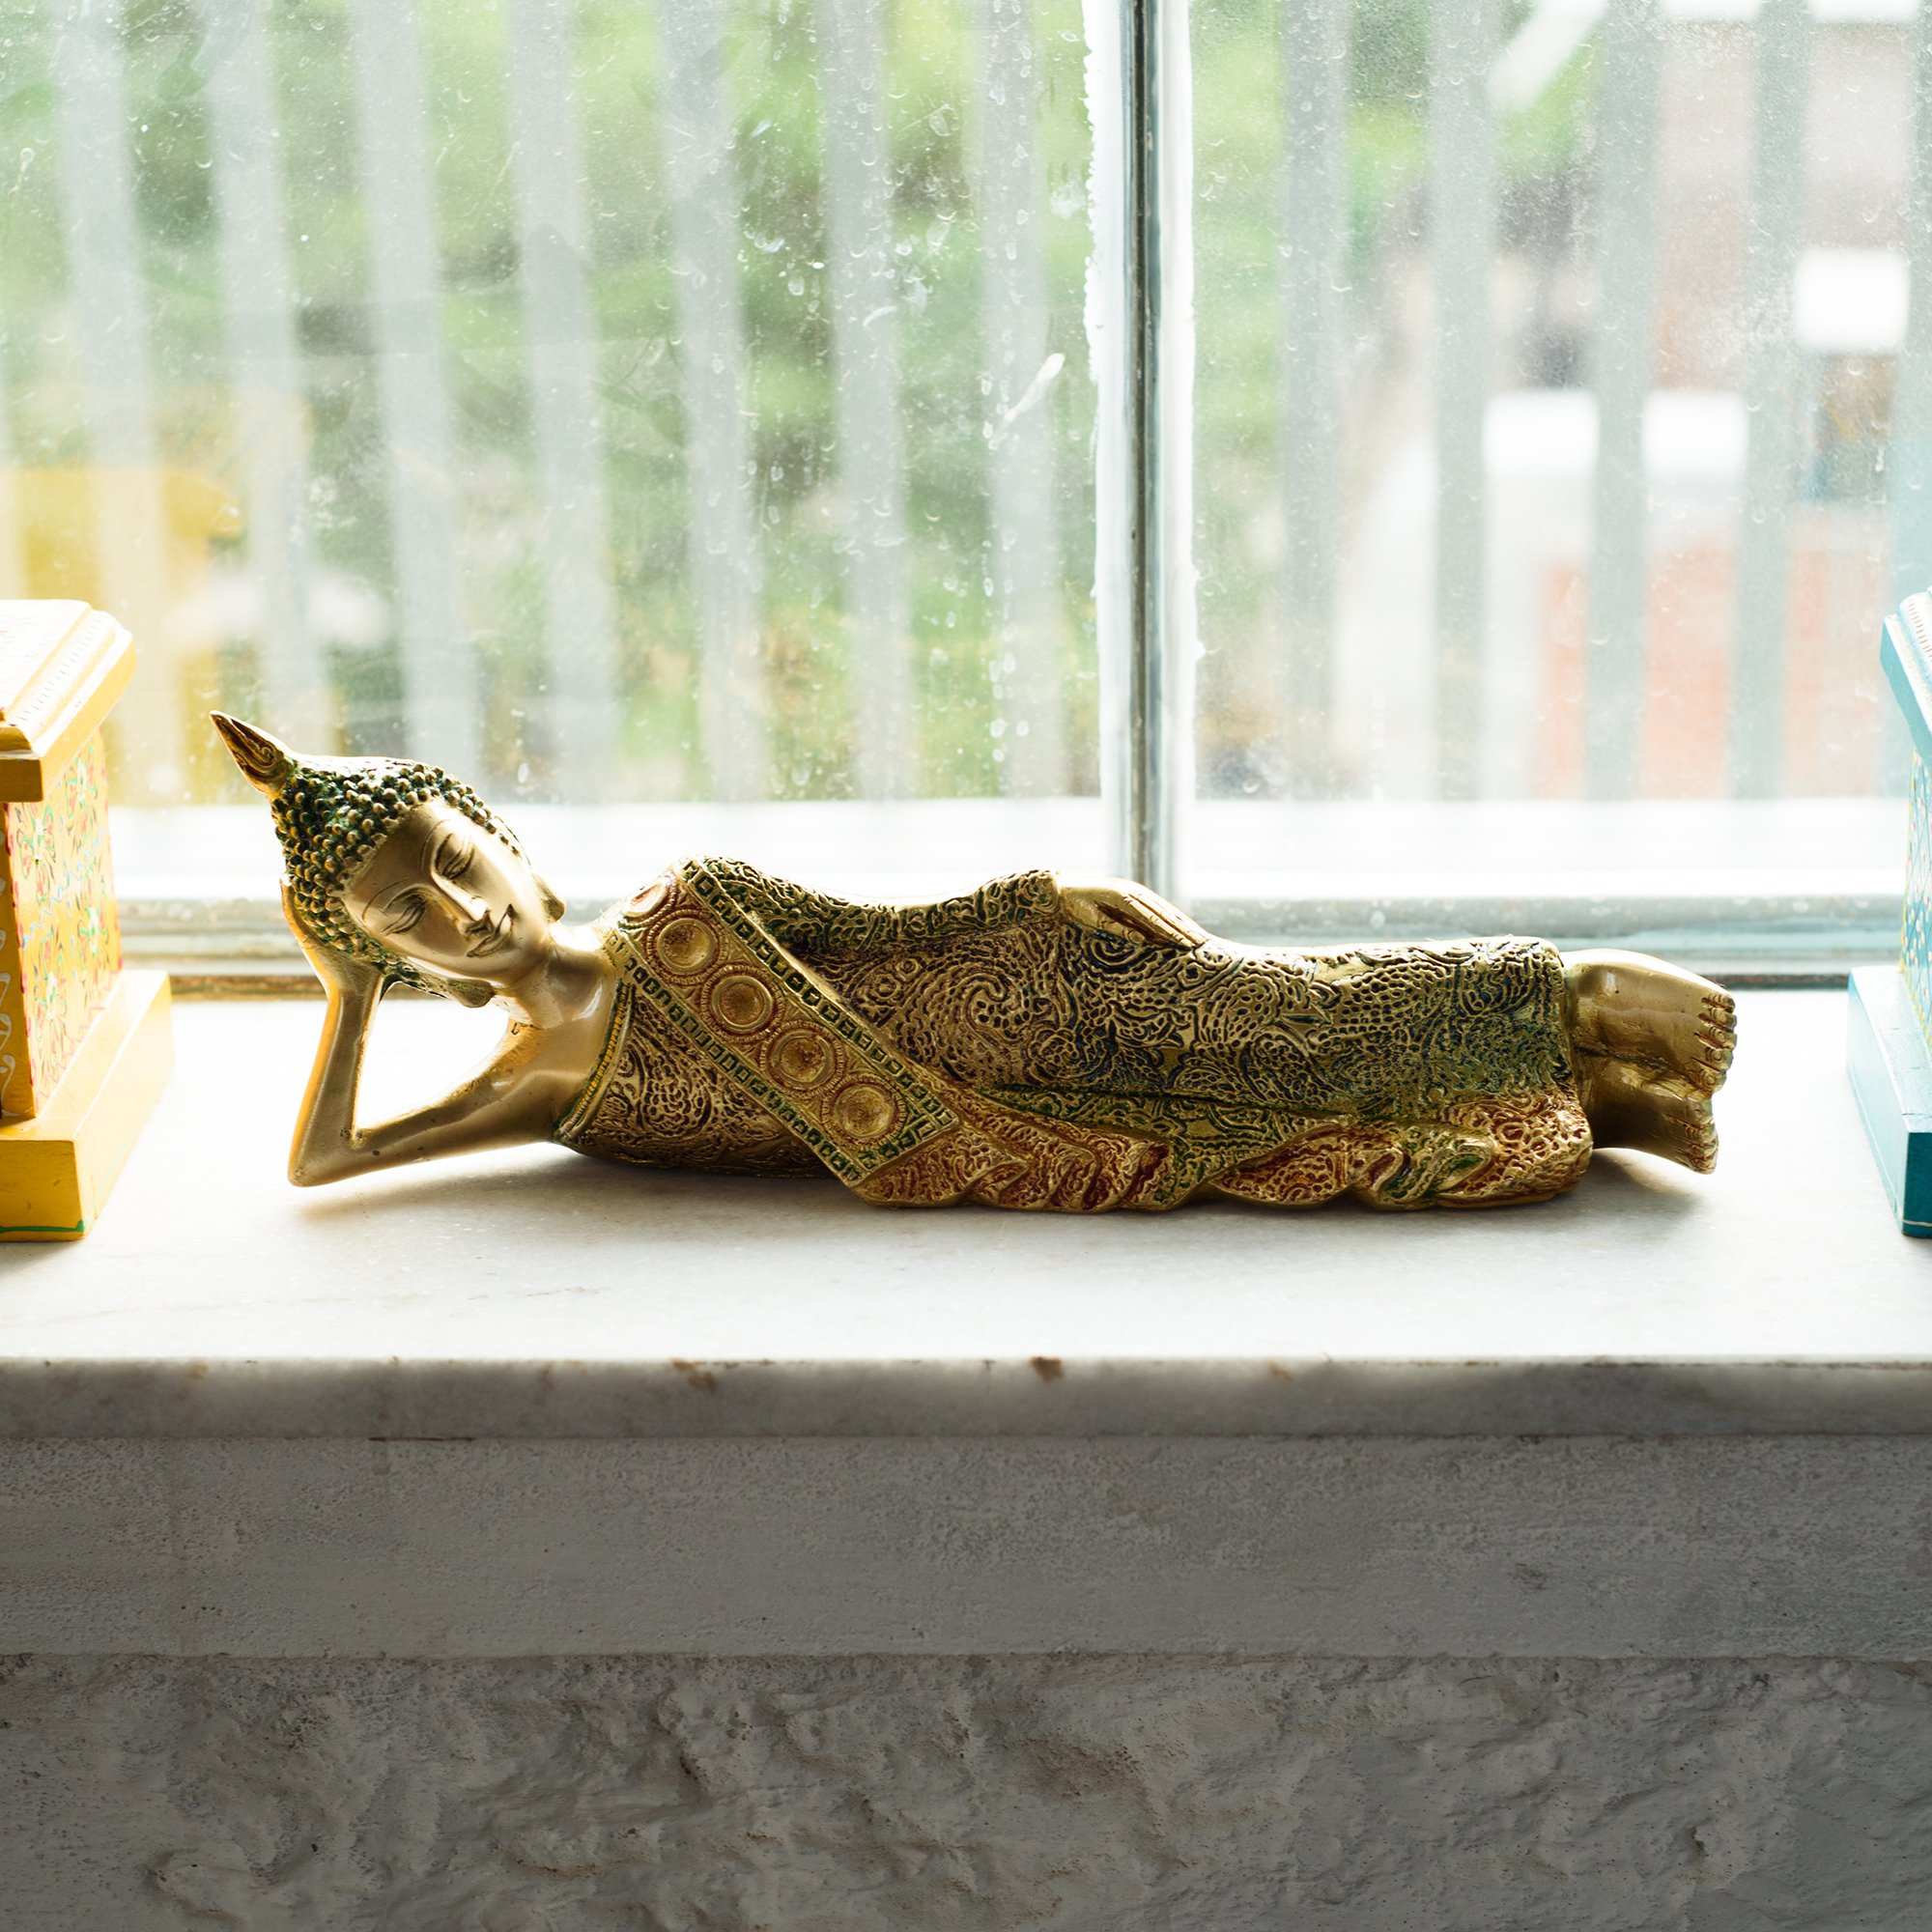 eCraftIndia Brass Decorative Thai Reclining Buddha Antique Showpiece by eCraftIndia